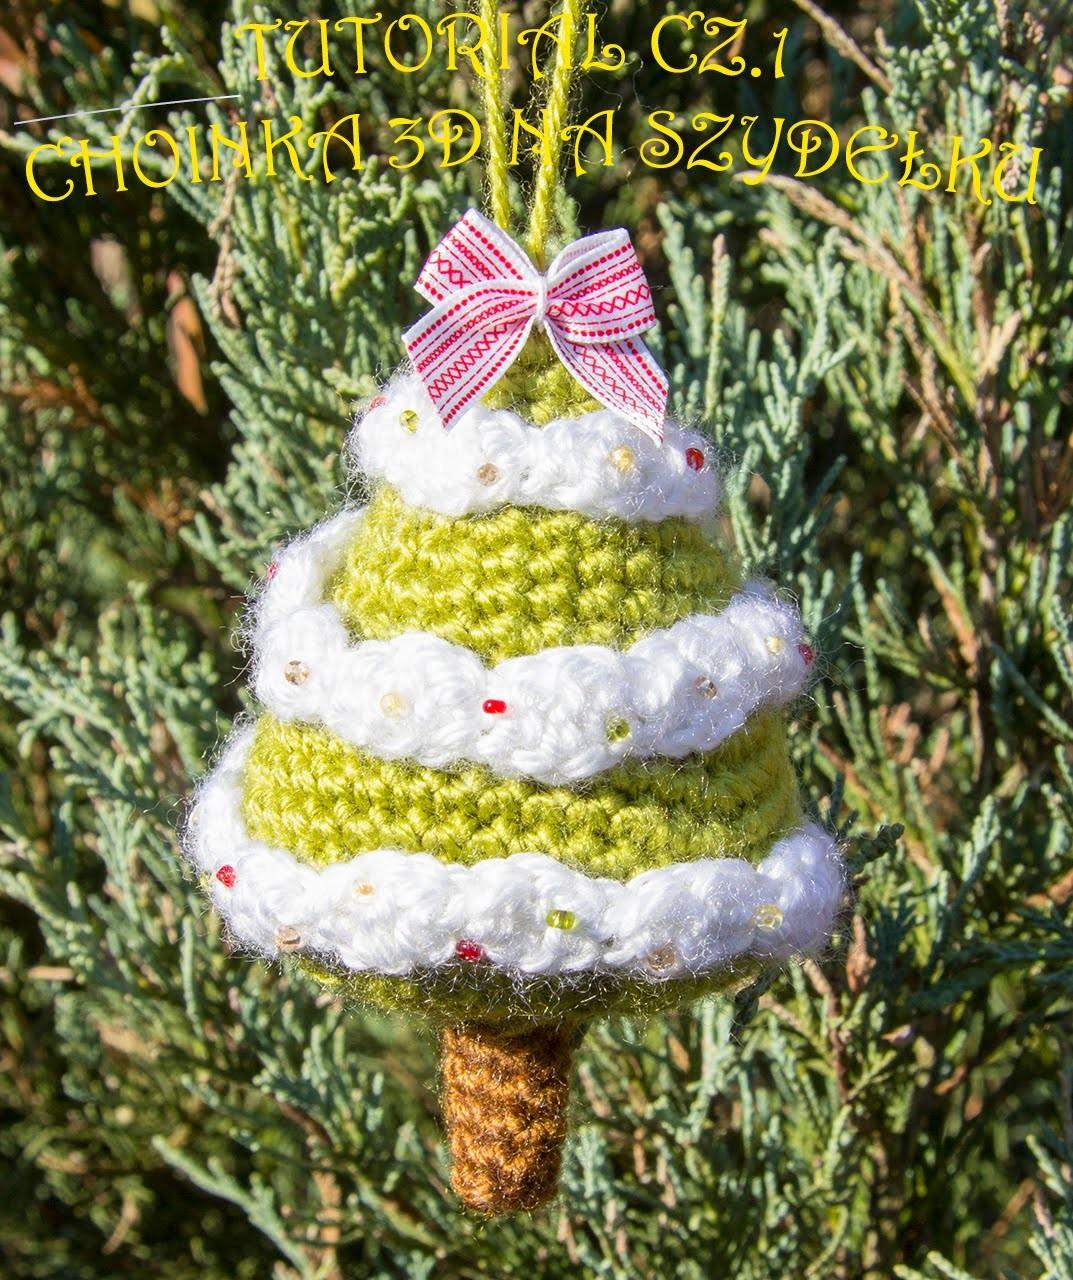 Choinka na szydełku 3d cz.1 tutorial (crochet christmas tree 3D part 1)